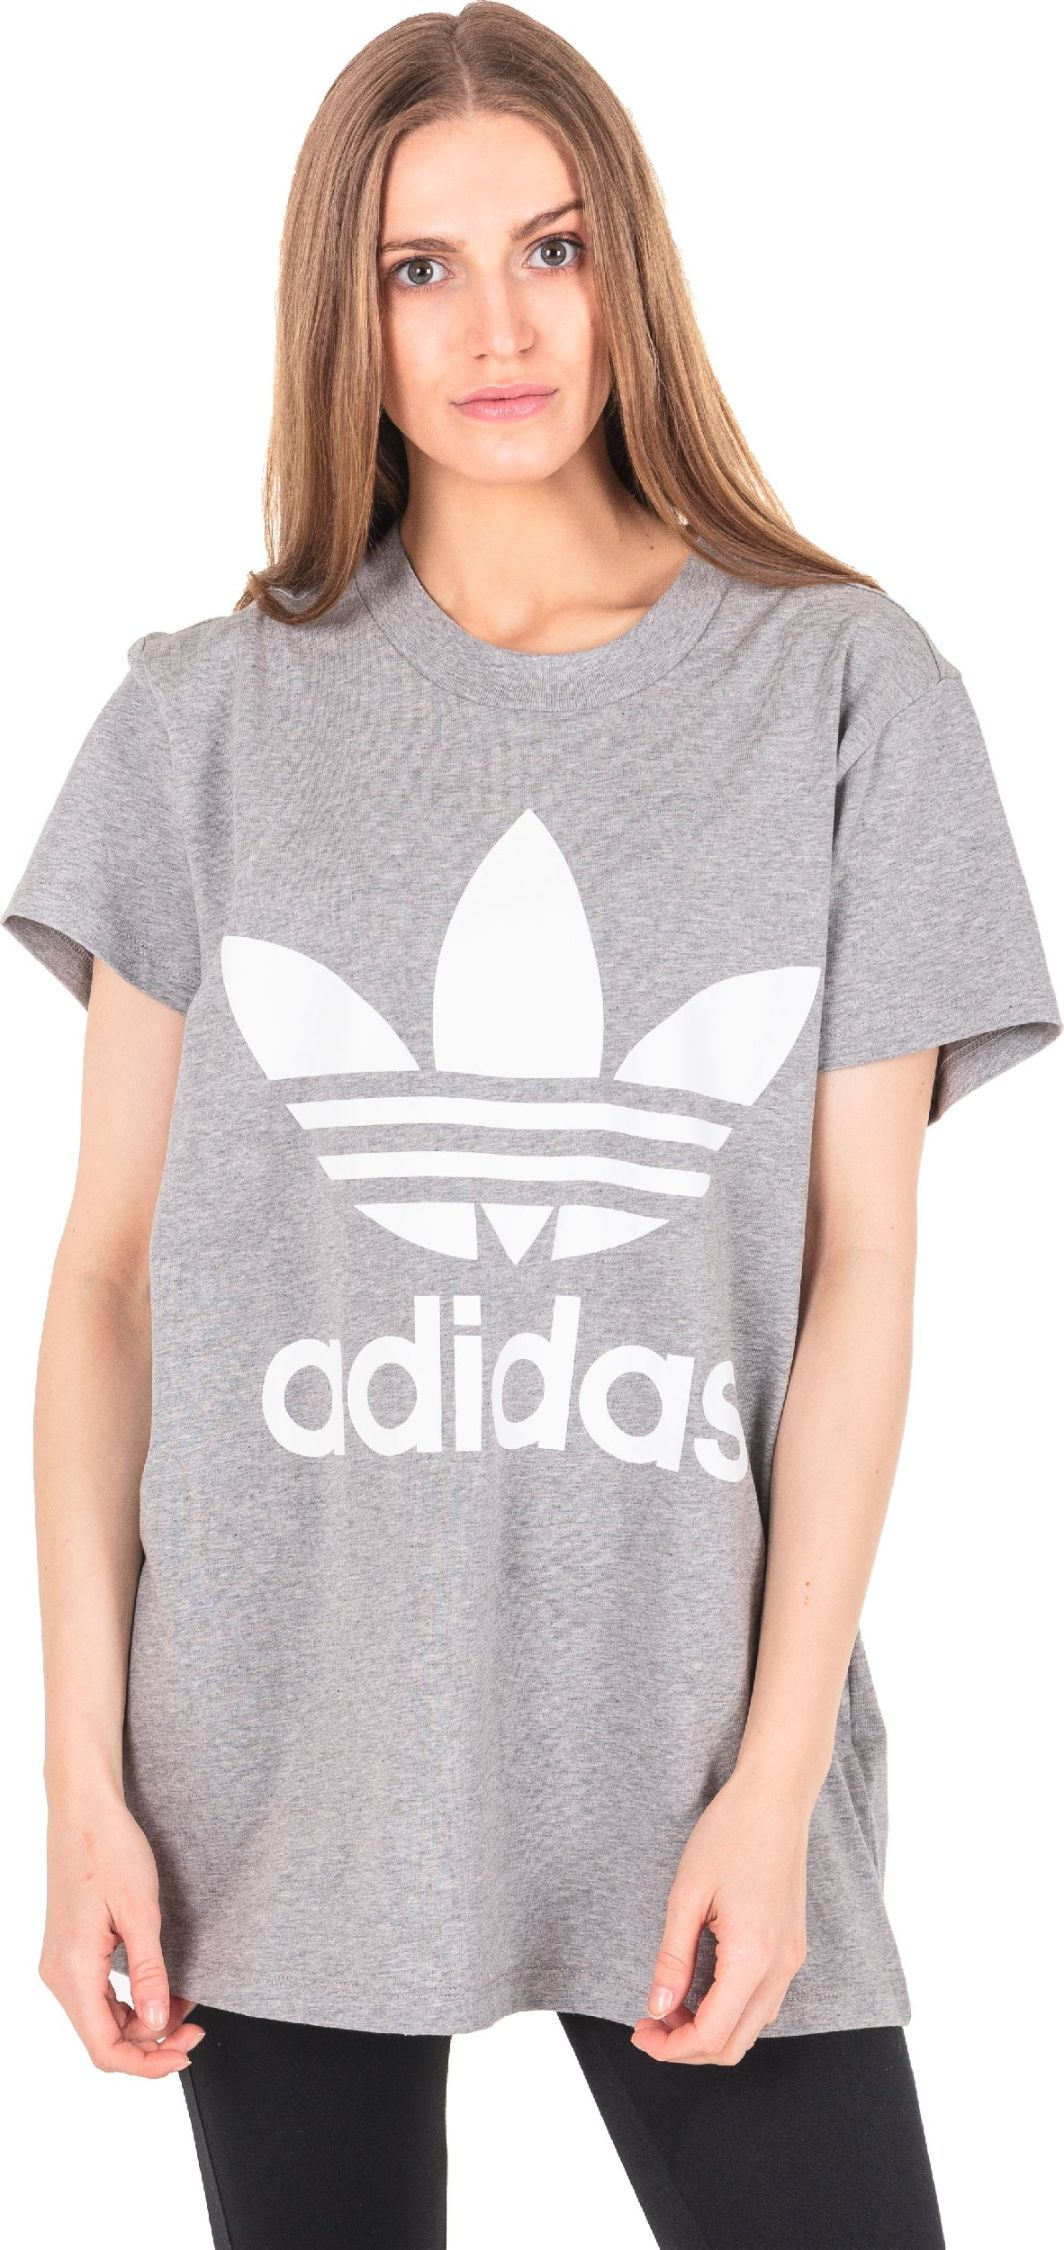 Adidas Koszulka damska Originals Trefoil Tee CY4762 CY4762 szara r. 40 (CY4762) ID produktu: 4000096